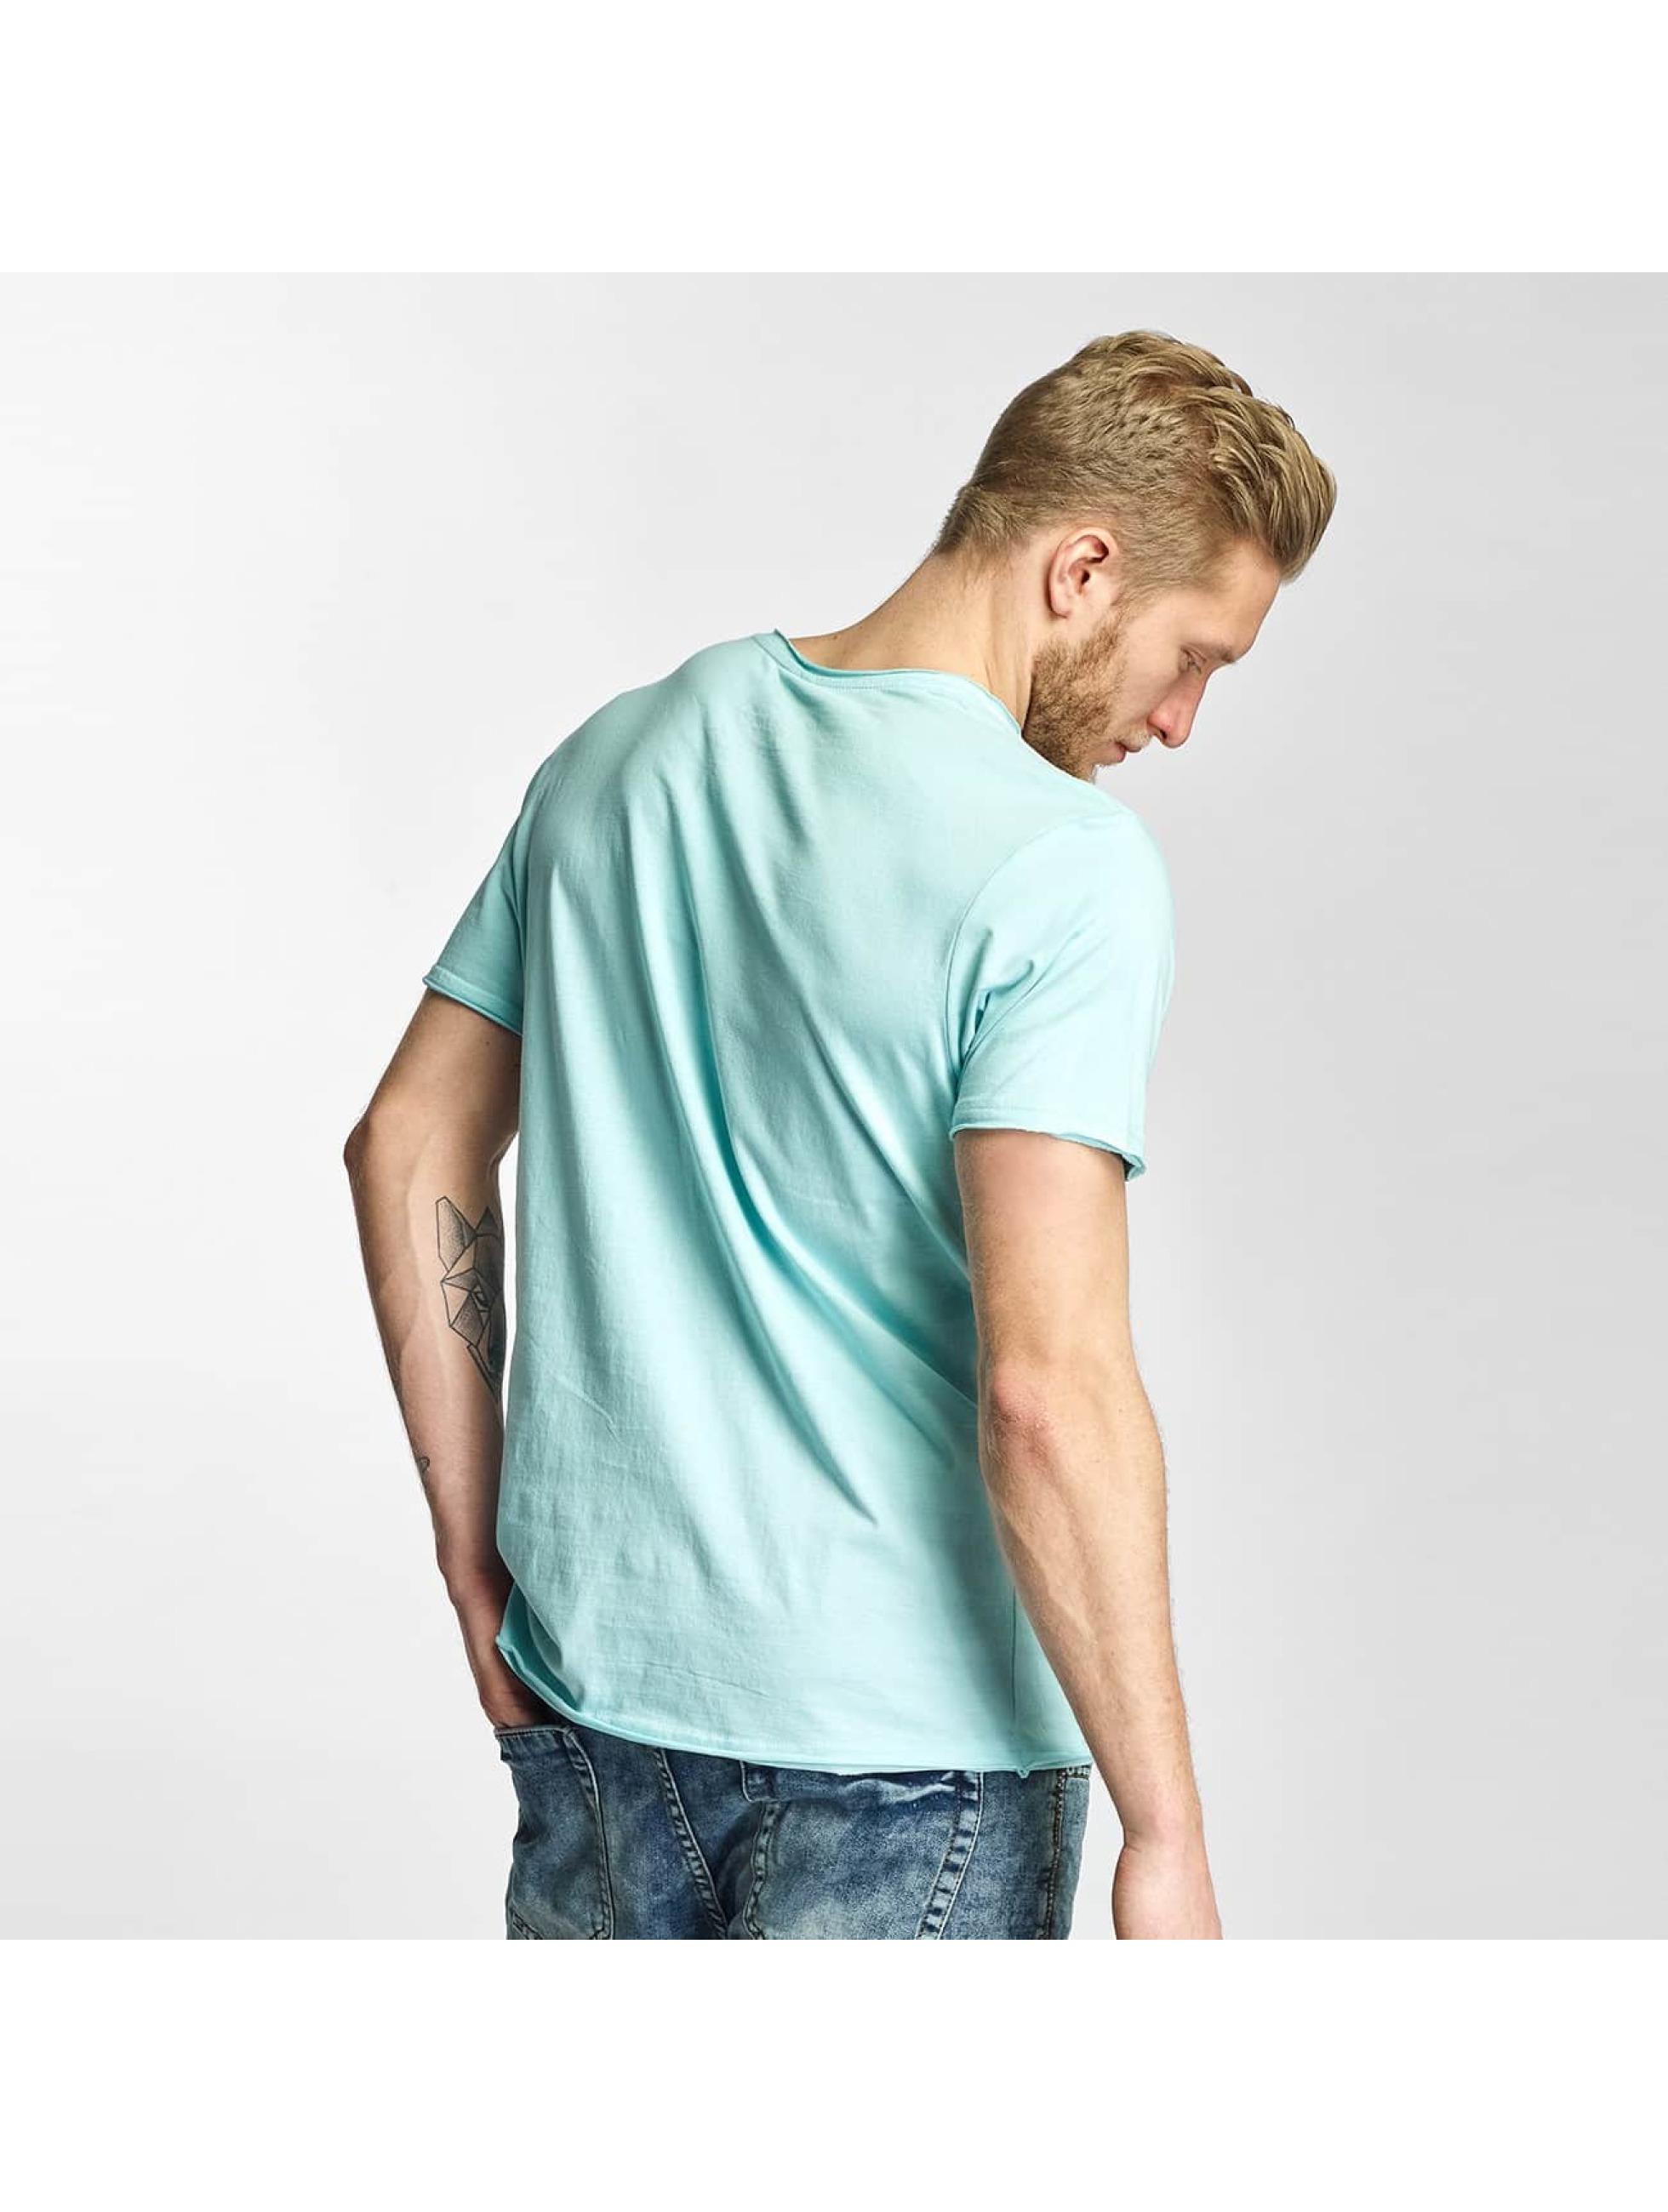 Sublevel-Uomini-Maglieria-T-shirt-Surf-Culture